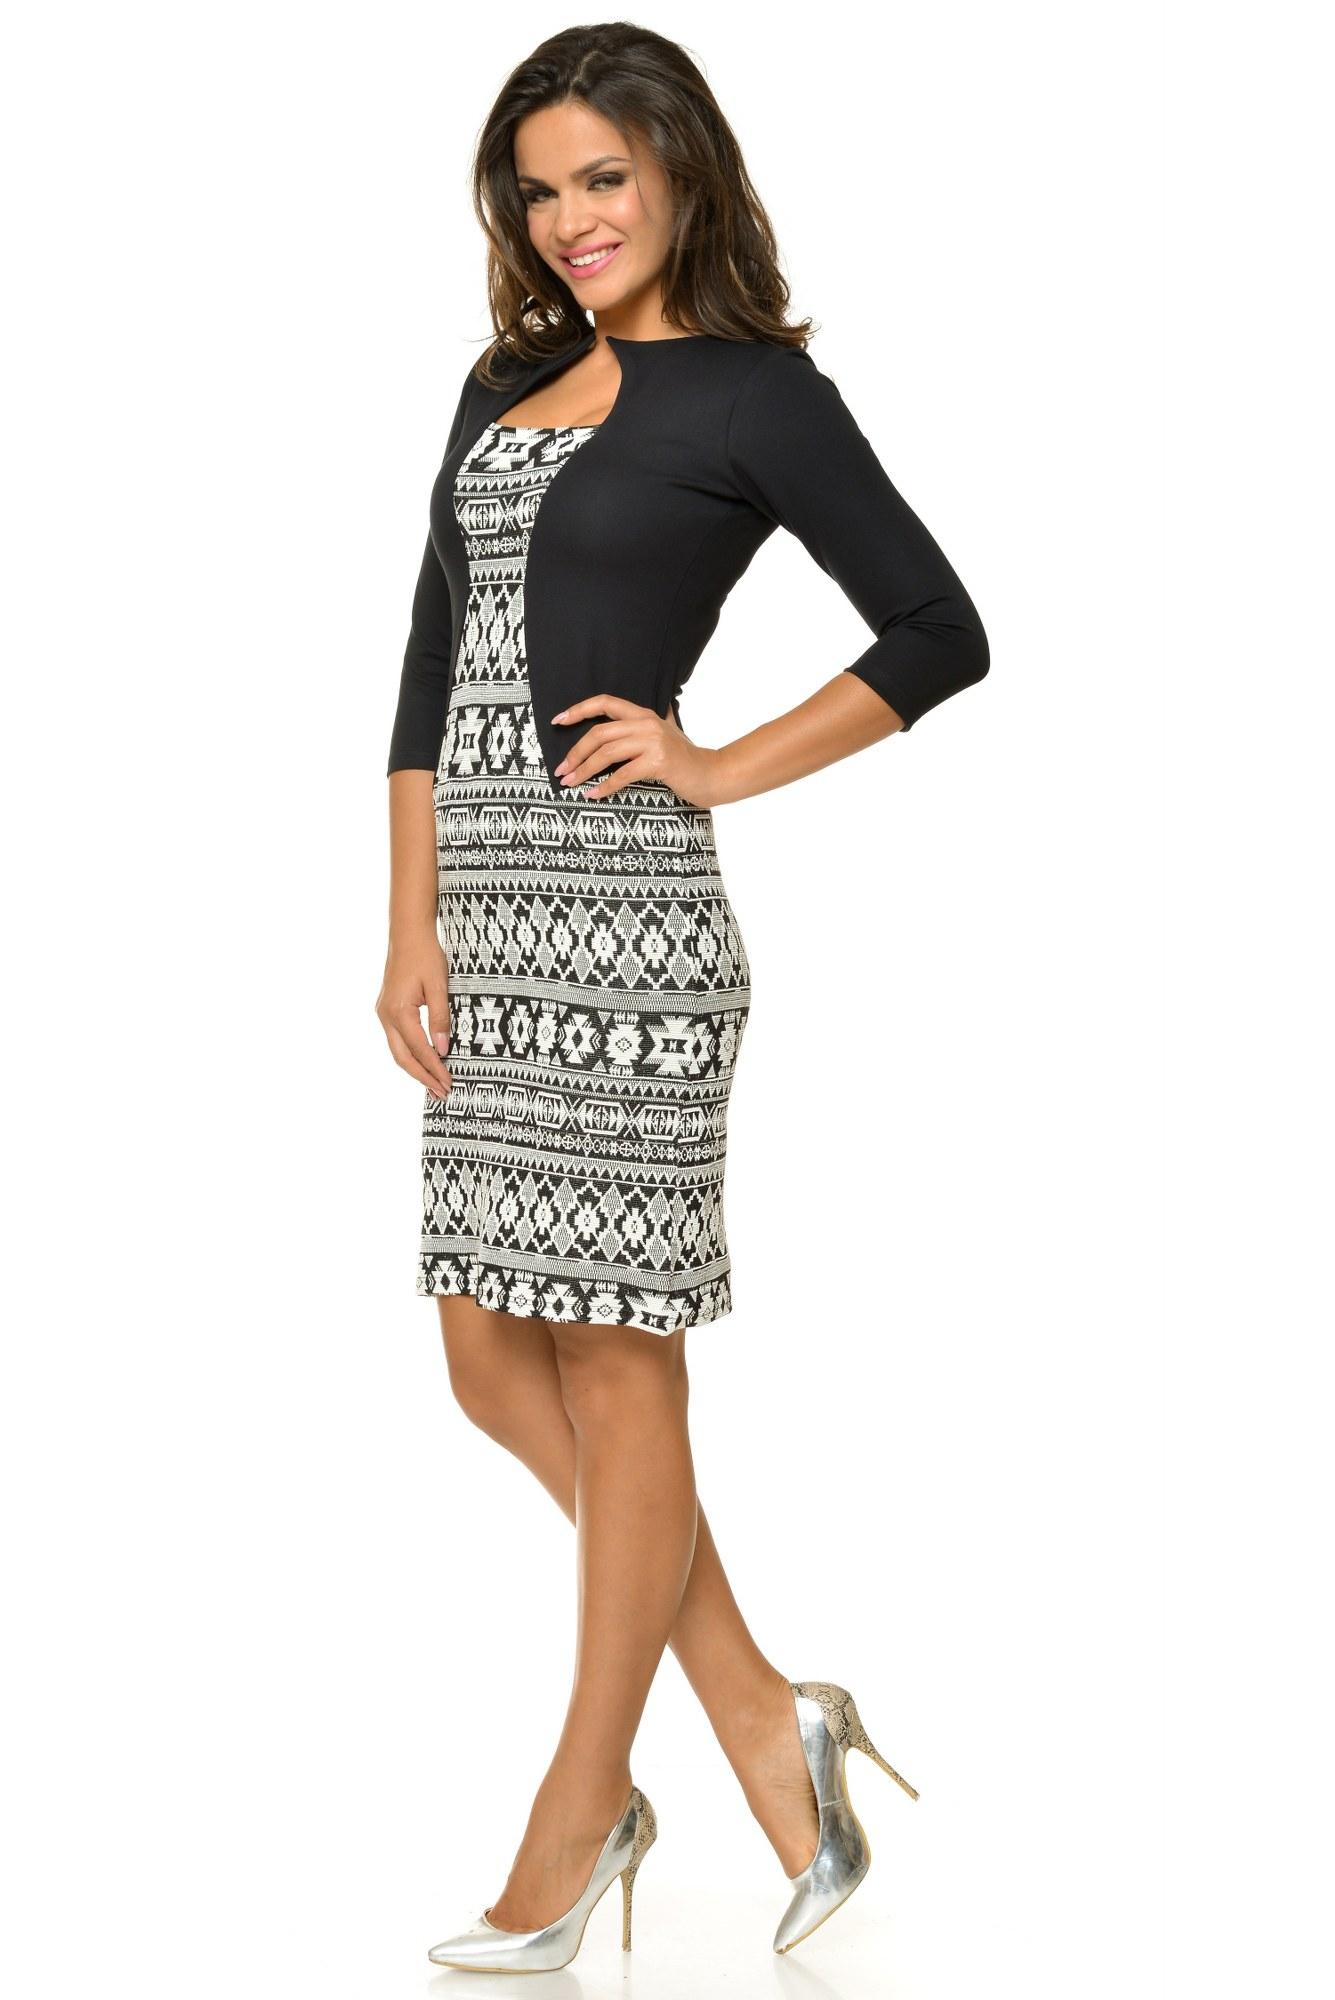 Rochie alb-negru office Natalee imprimata